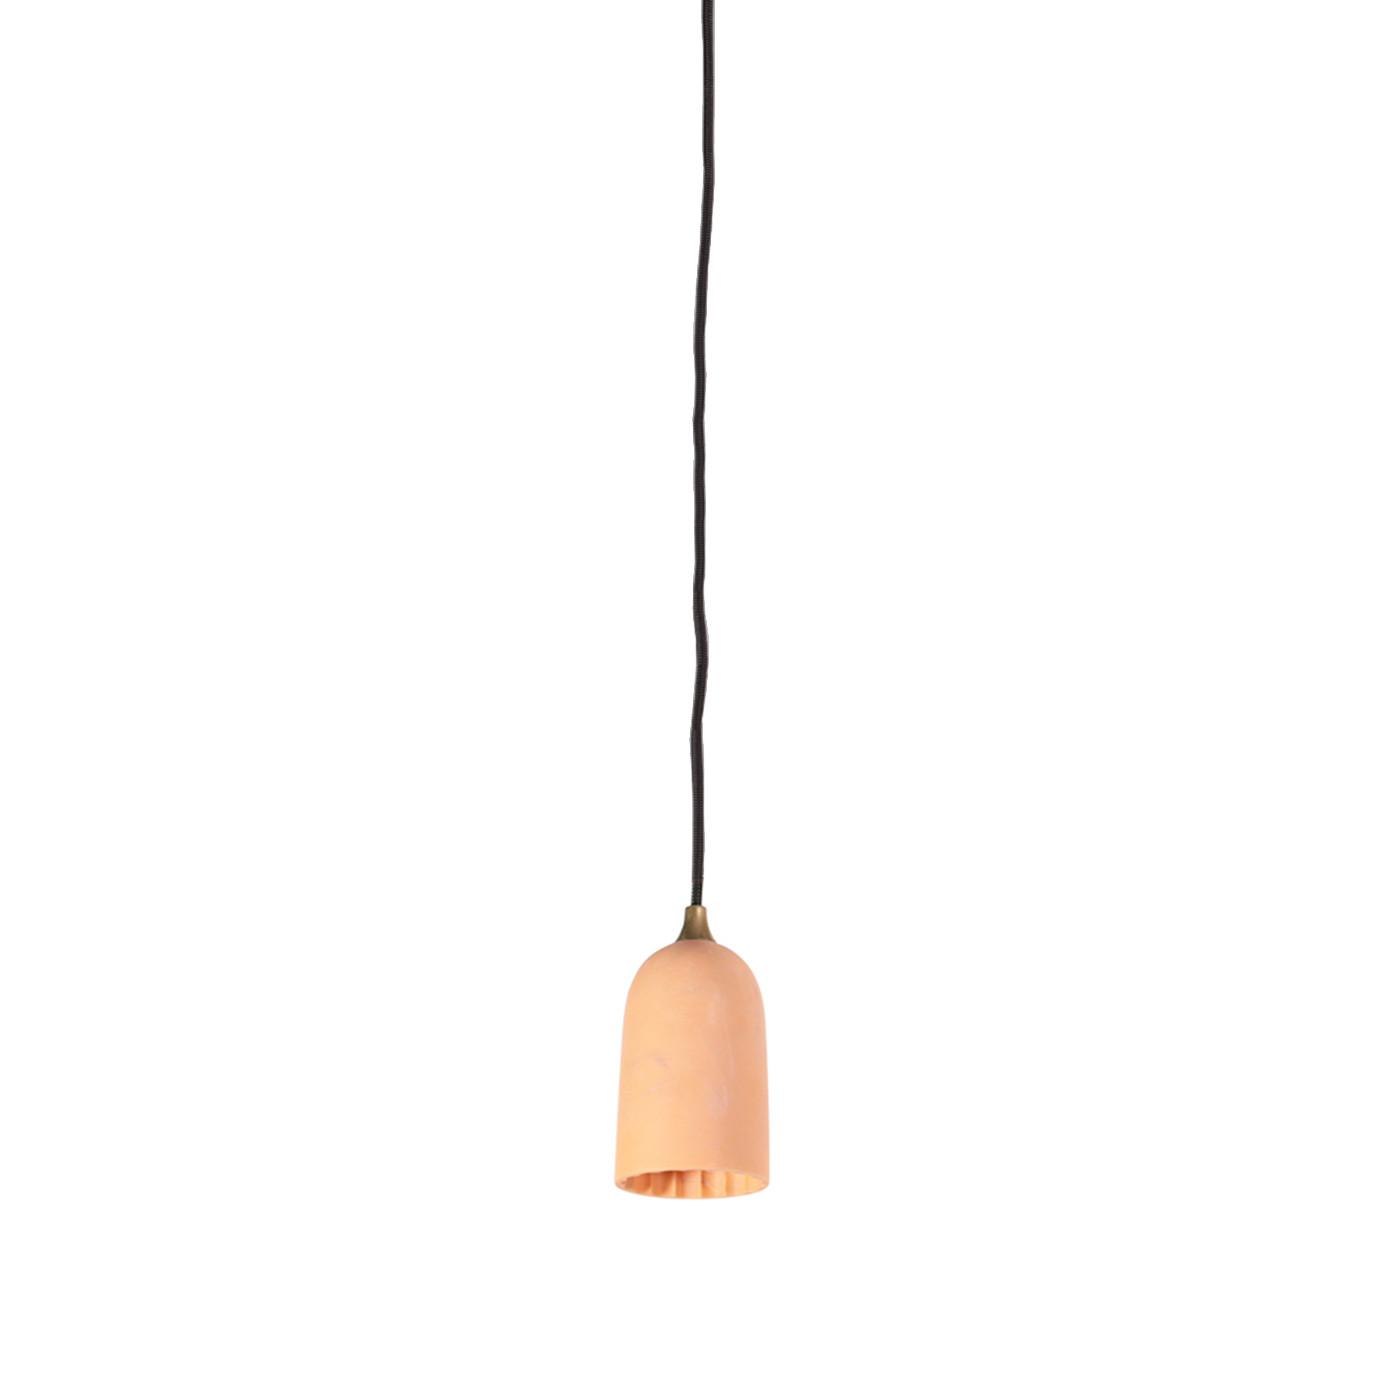 Image of: Innermost Doric 8 Pendant Light At Nostraforma